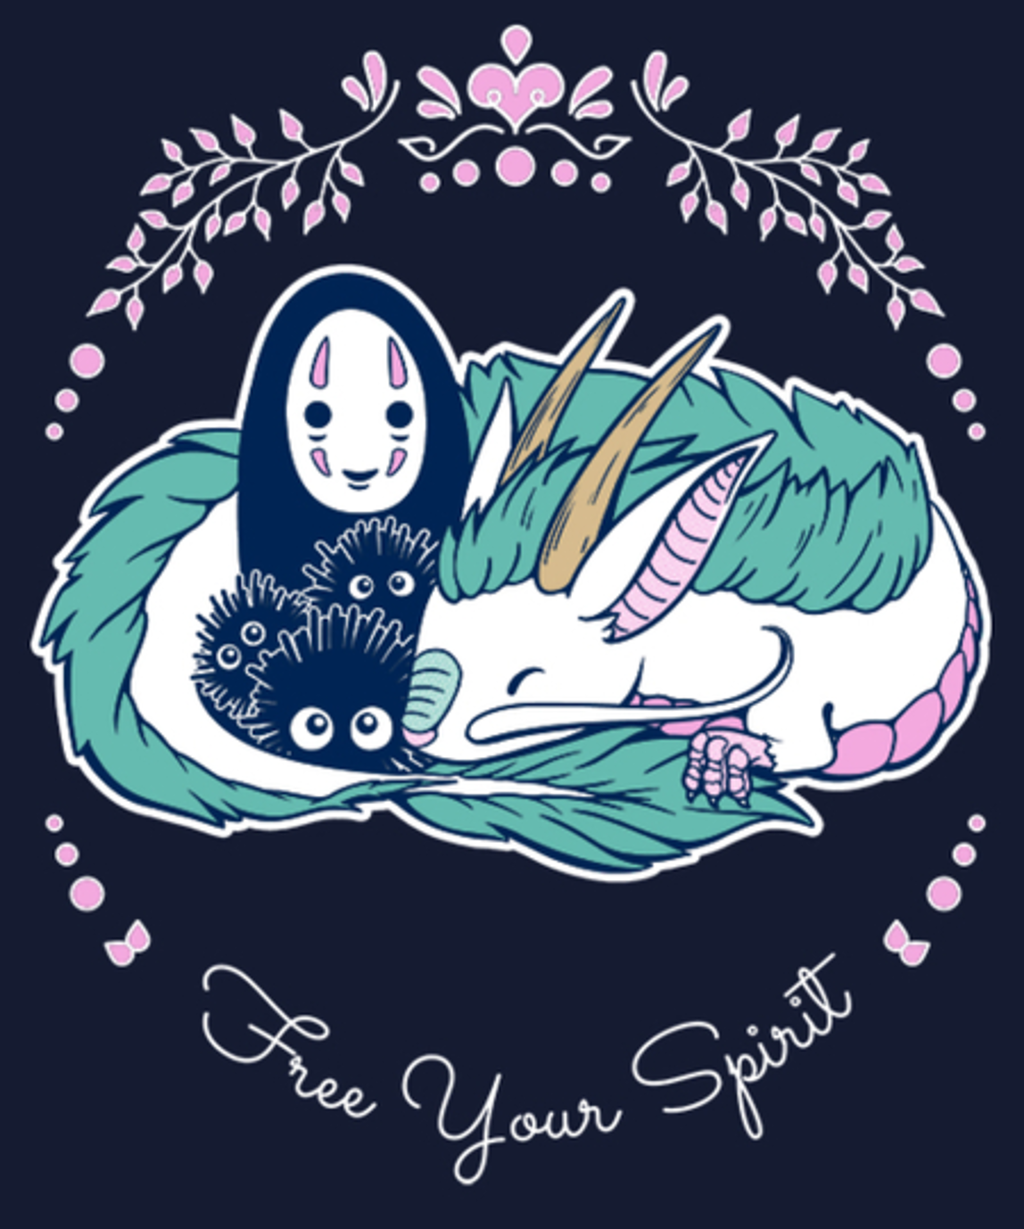 Qwertee: Free Your Spirit